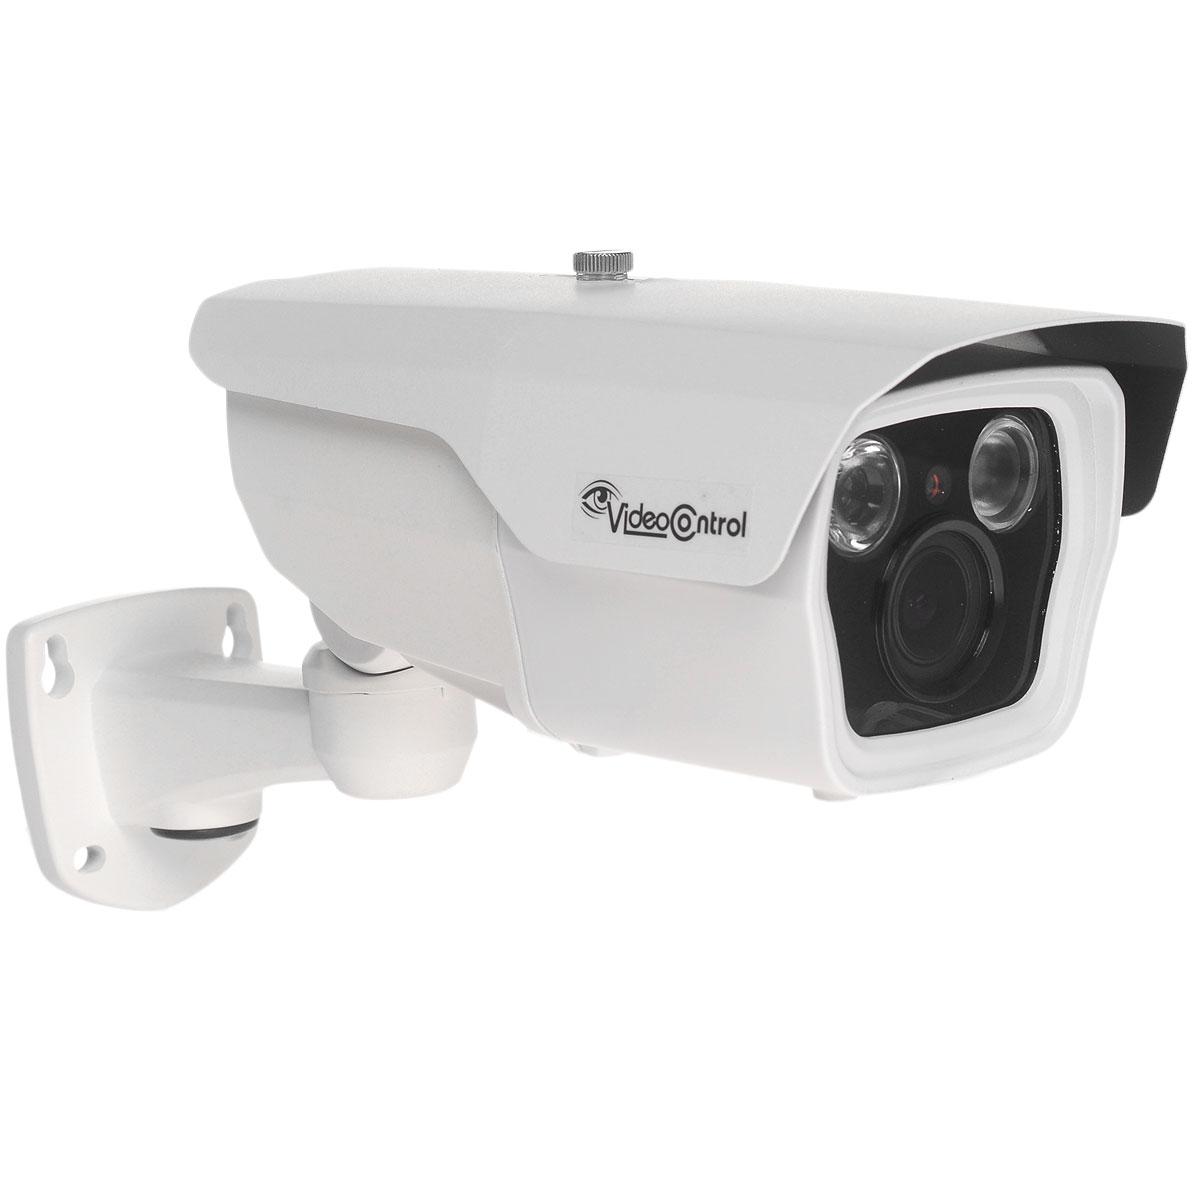 Video Control VC-DIRP6610IPS-P IP камера видеонаблюдения